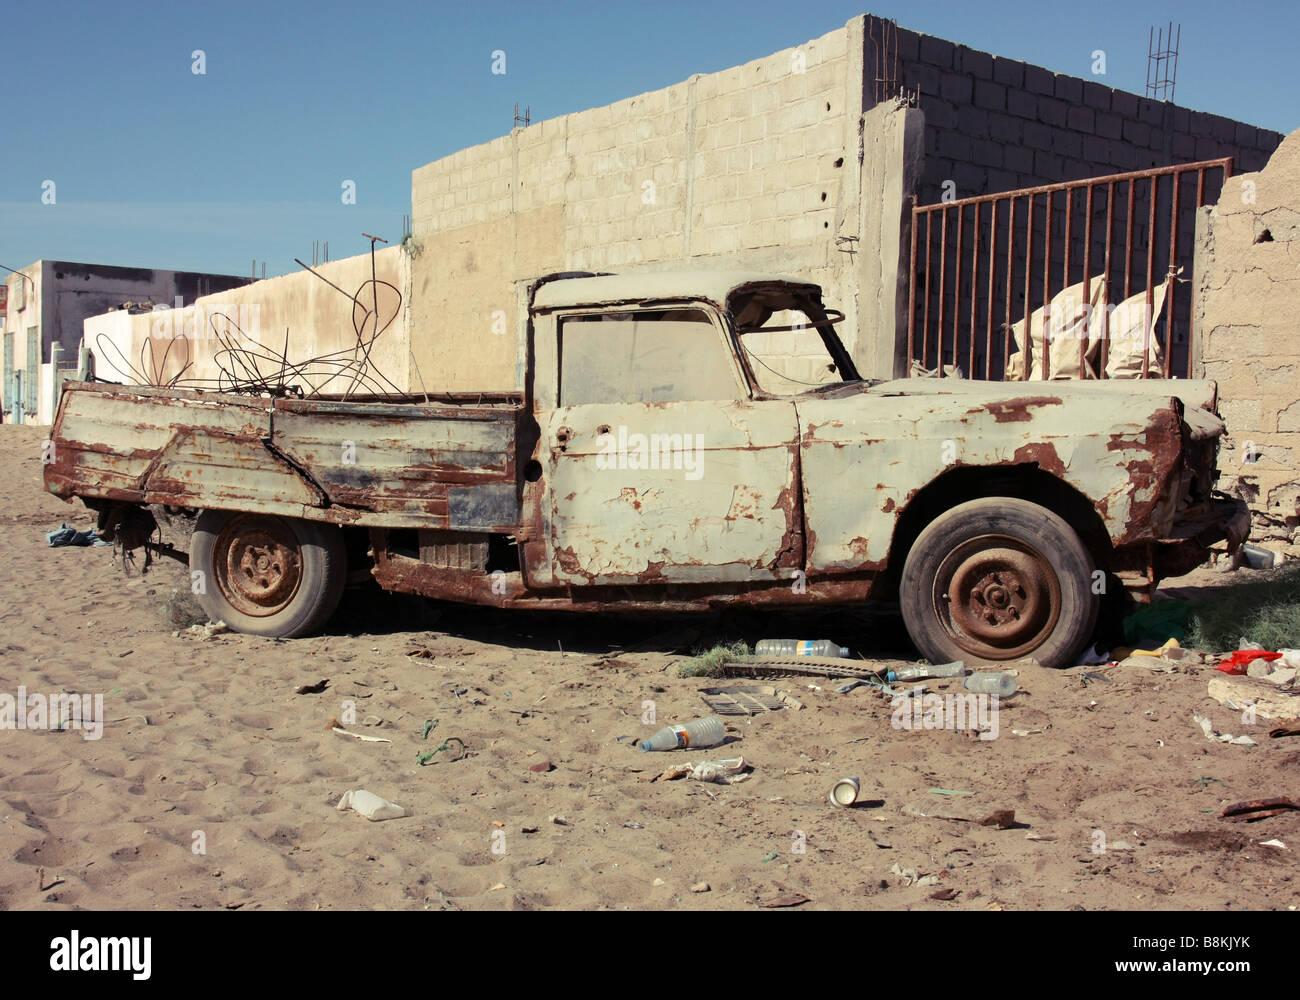 Battered Peaugot pickup truck in Nouadhibou Mauritania Western Sahara - Stock Image